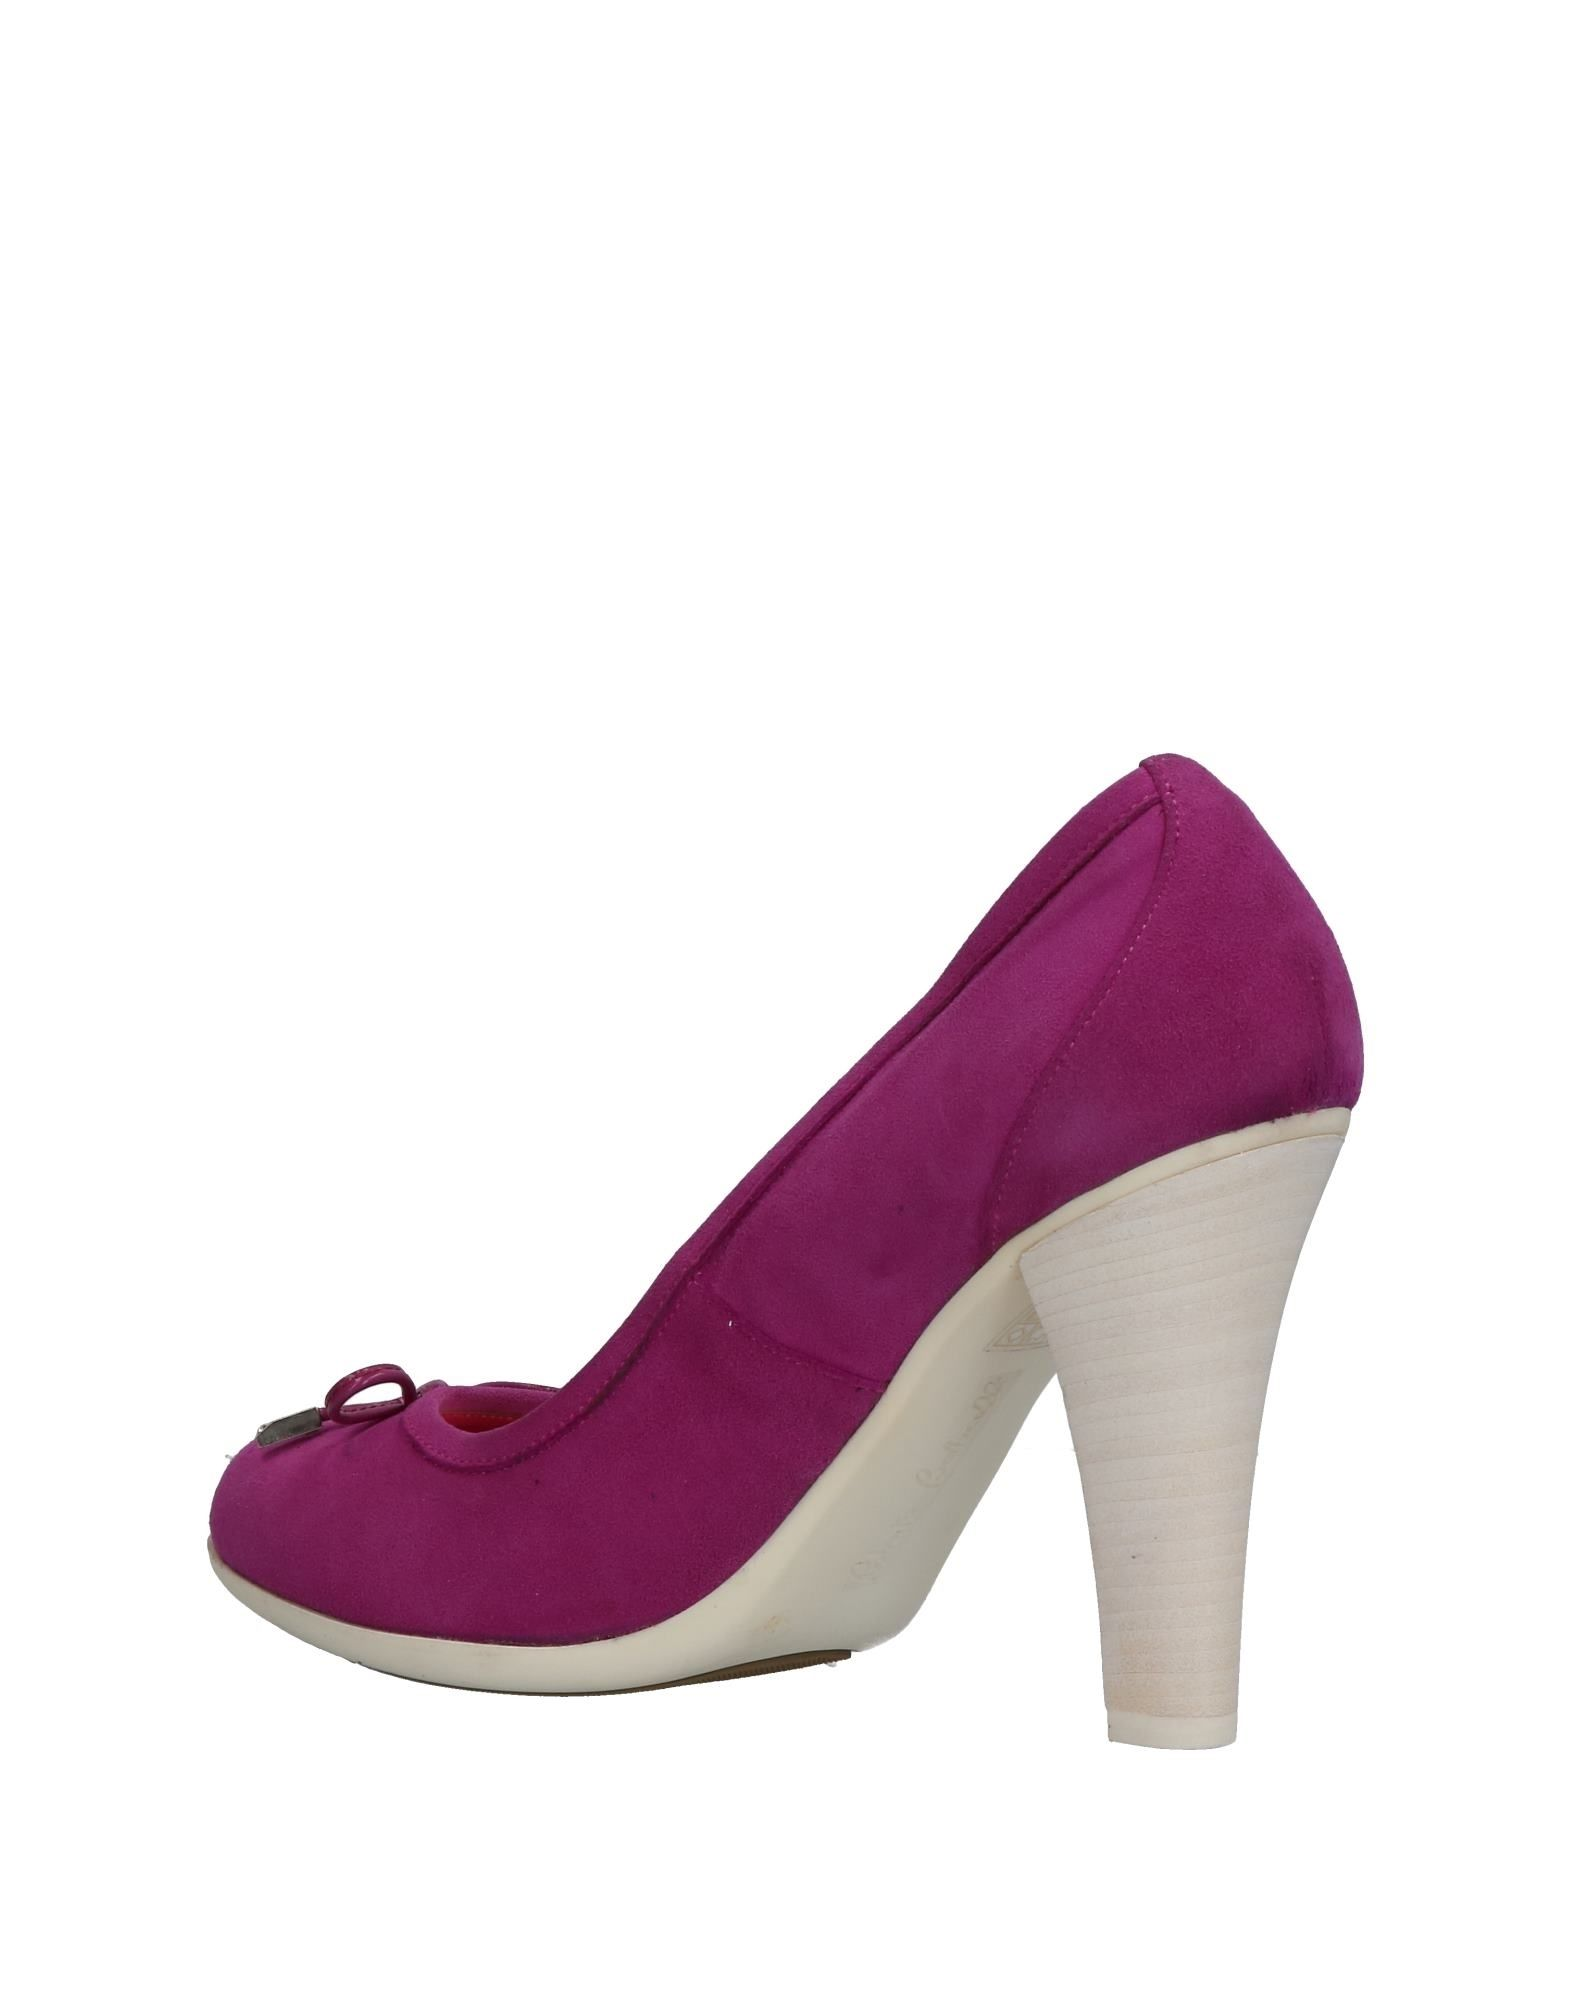 Roberto Botticelli Pumps Damen  11328994JX Gute Qualität beliebte Schuhe